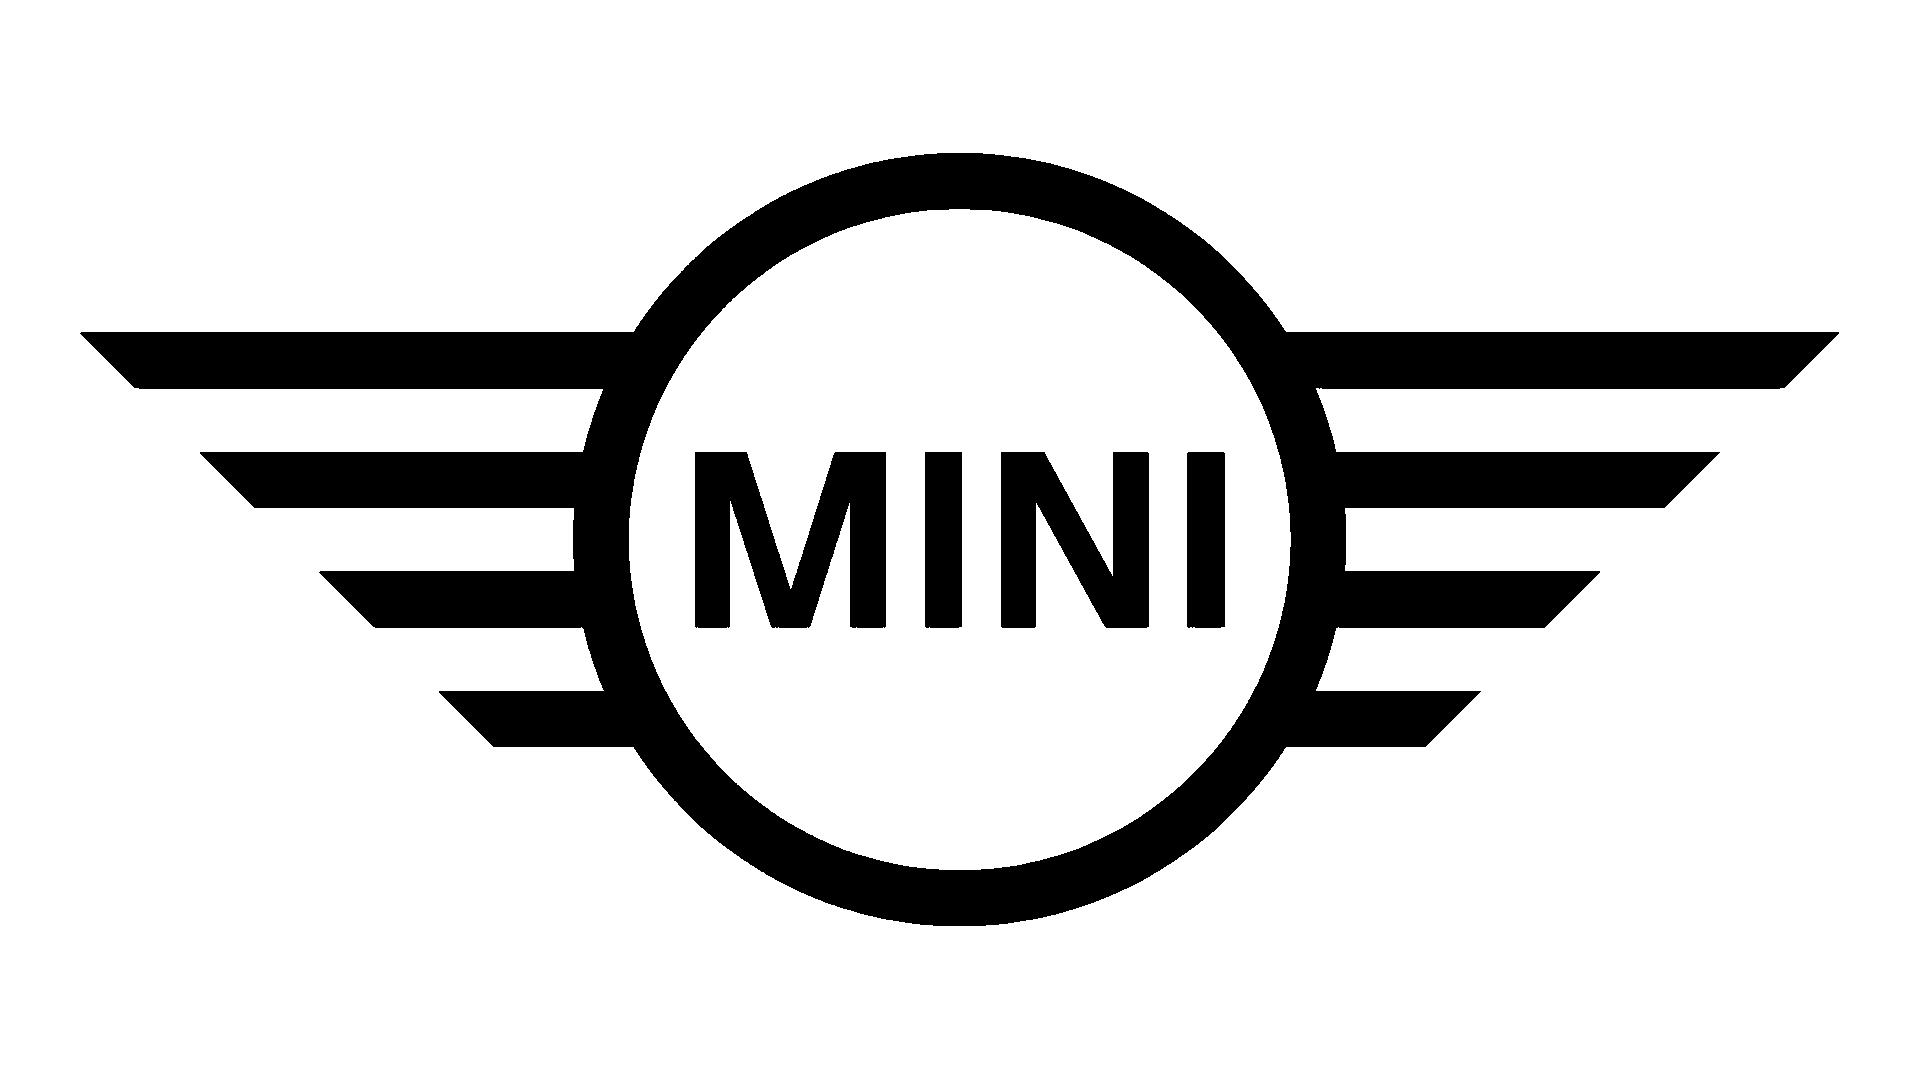 Mini Logo, HD Png, Meaning, Information | Carlogos.org